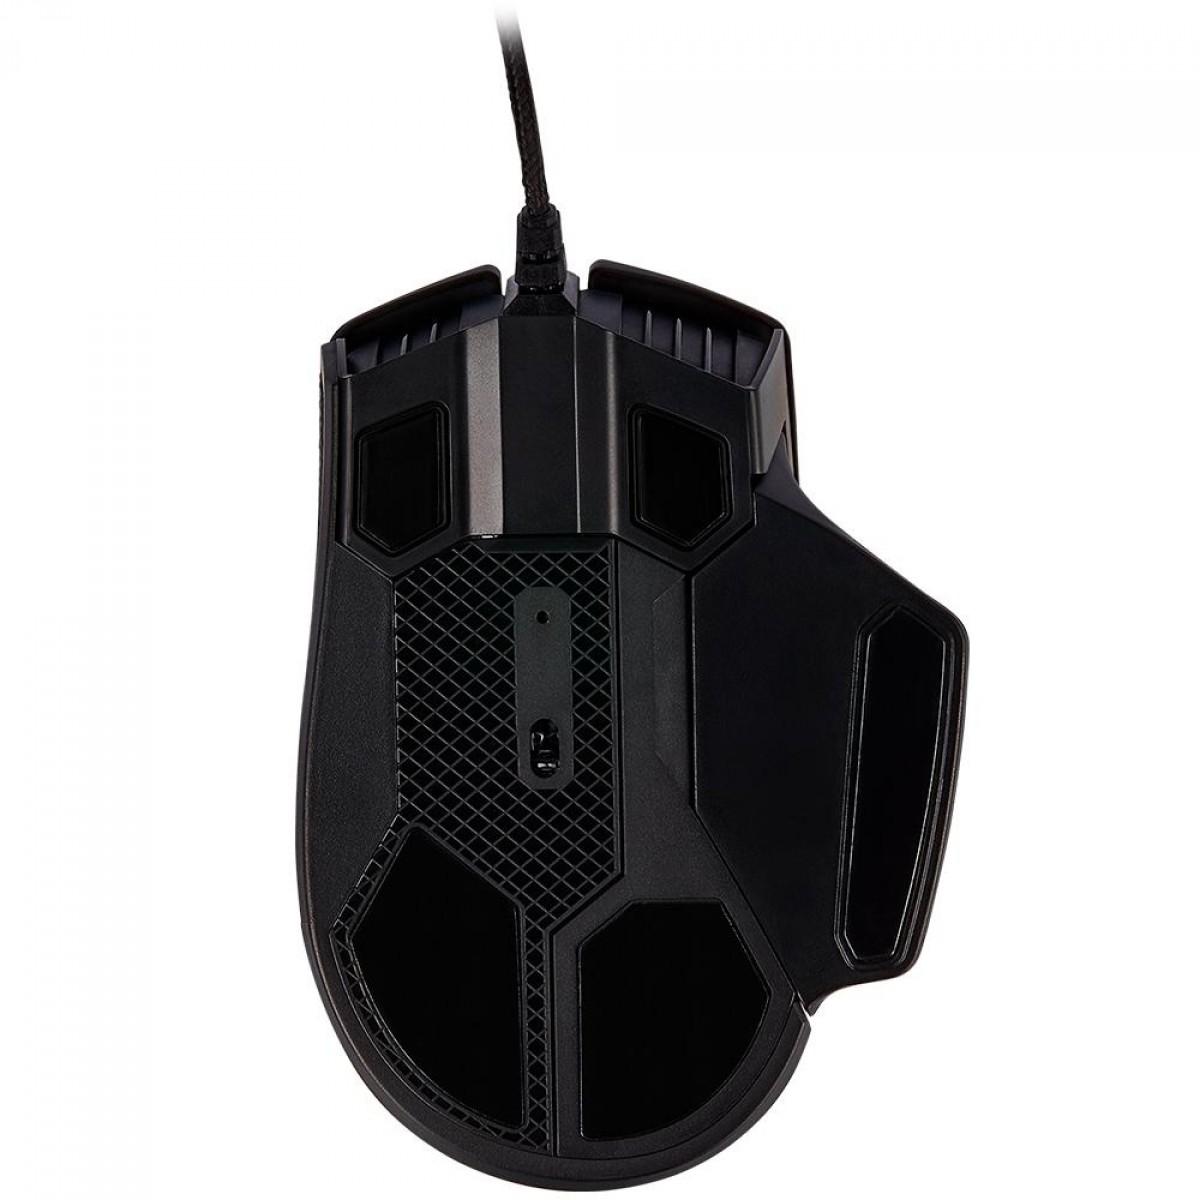 Mouse Gamer Corsair Glaive RGB PRO, 18.000 DPI, 7 Botões Programáveis, Black, CH-9302211-NA